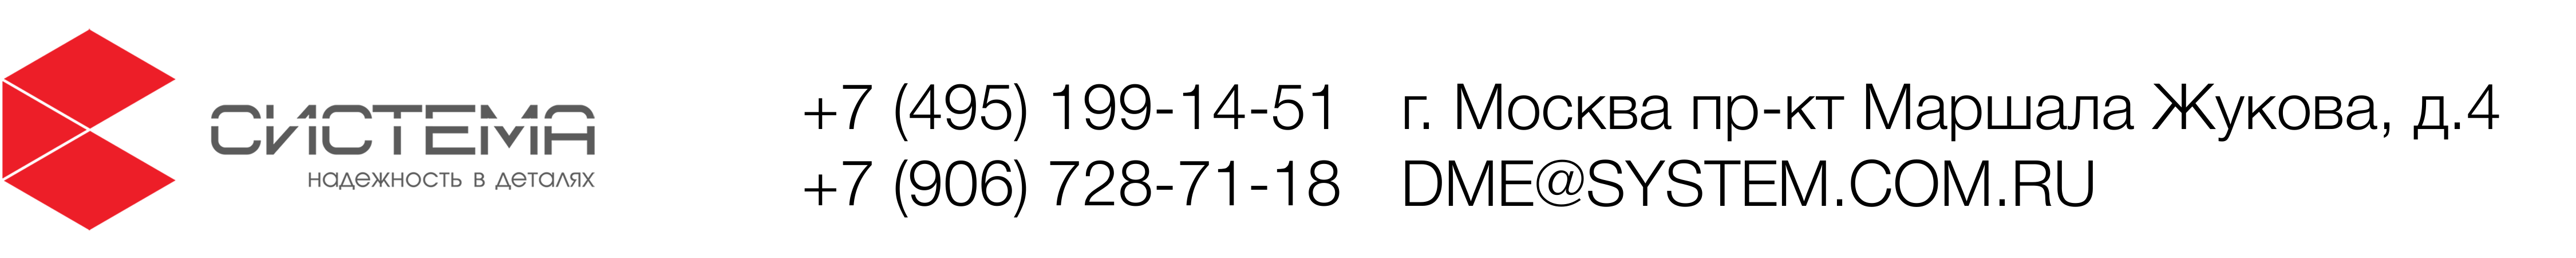 DMERU, SYSTEM